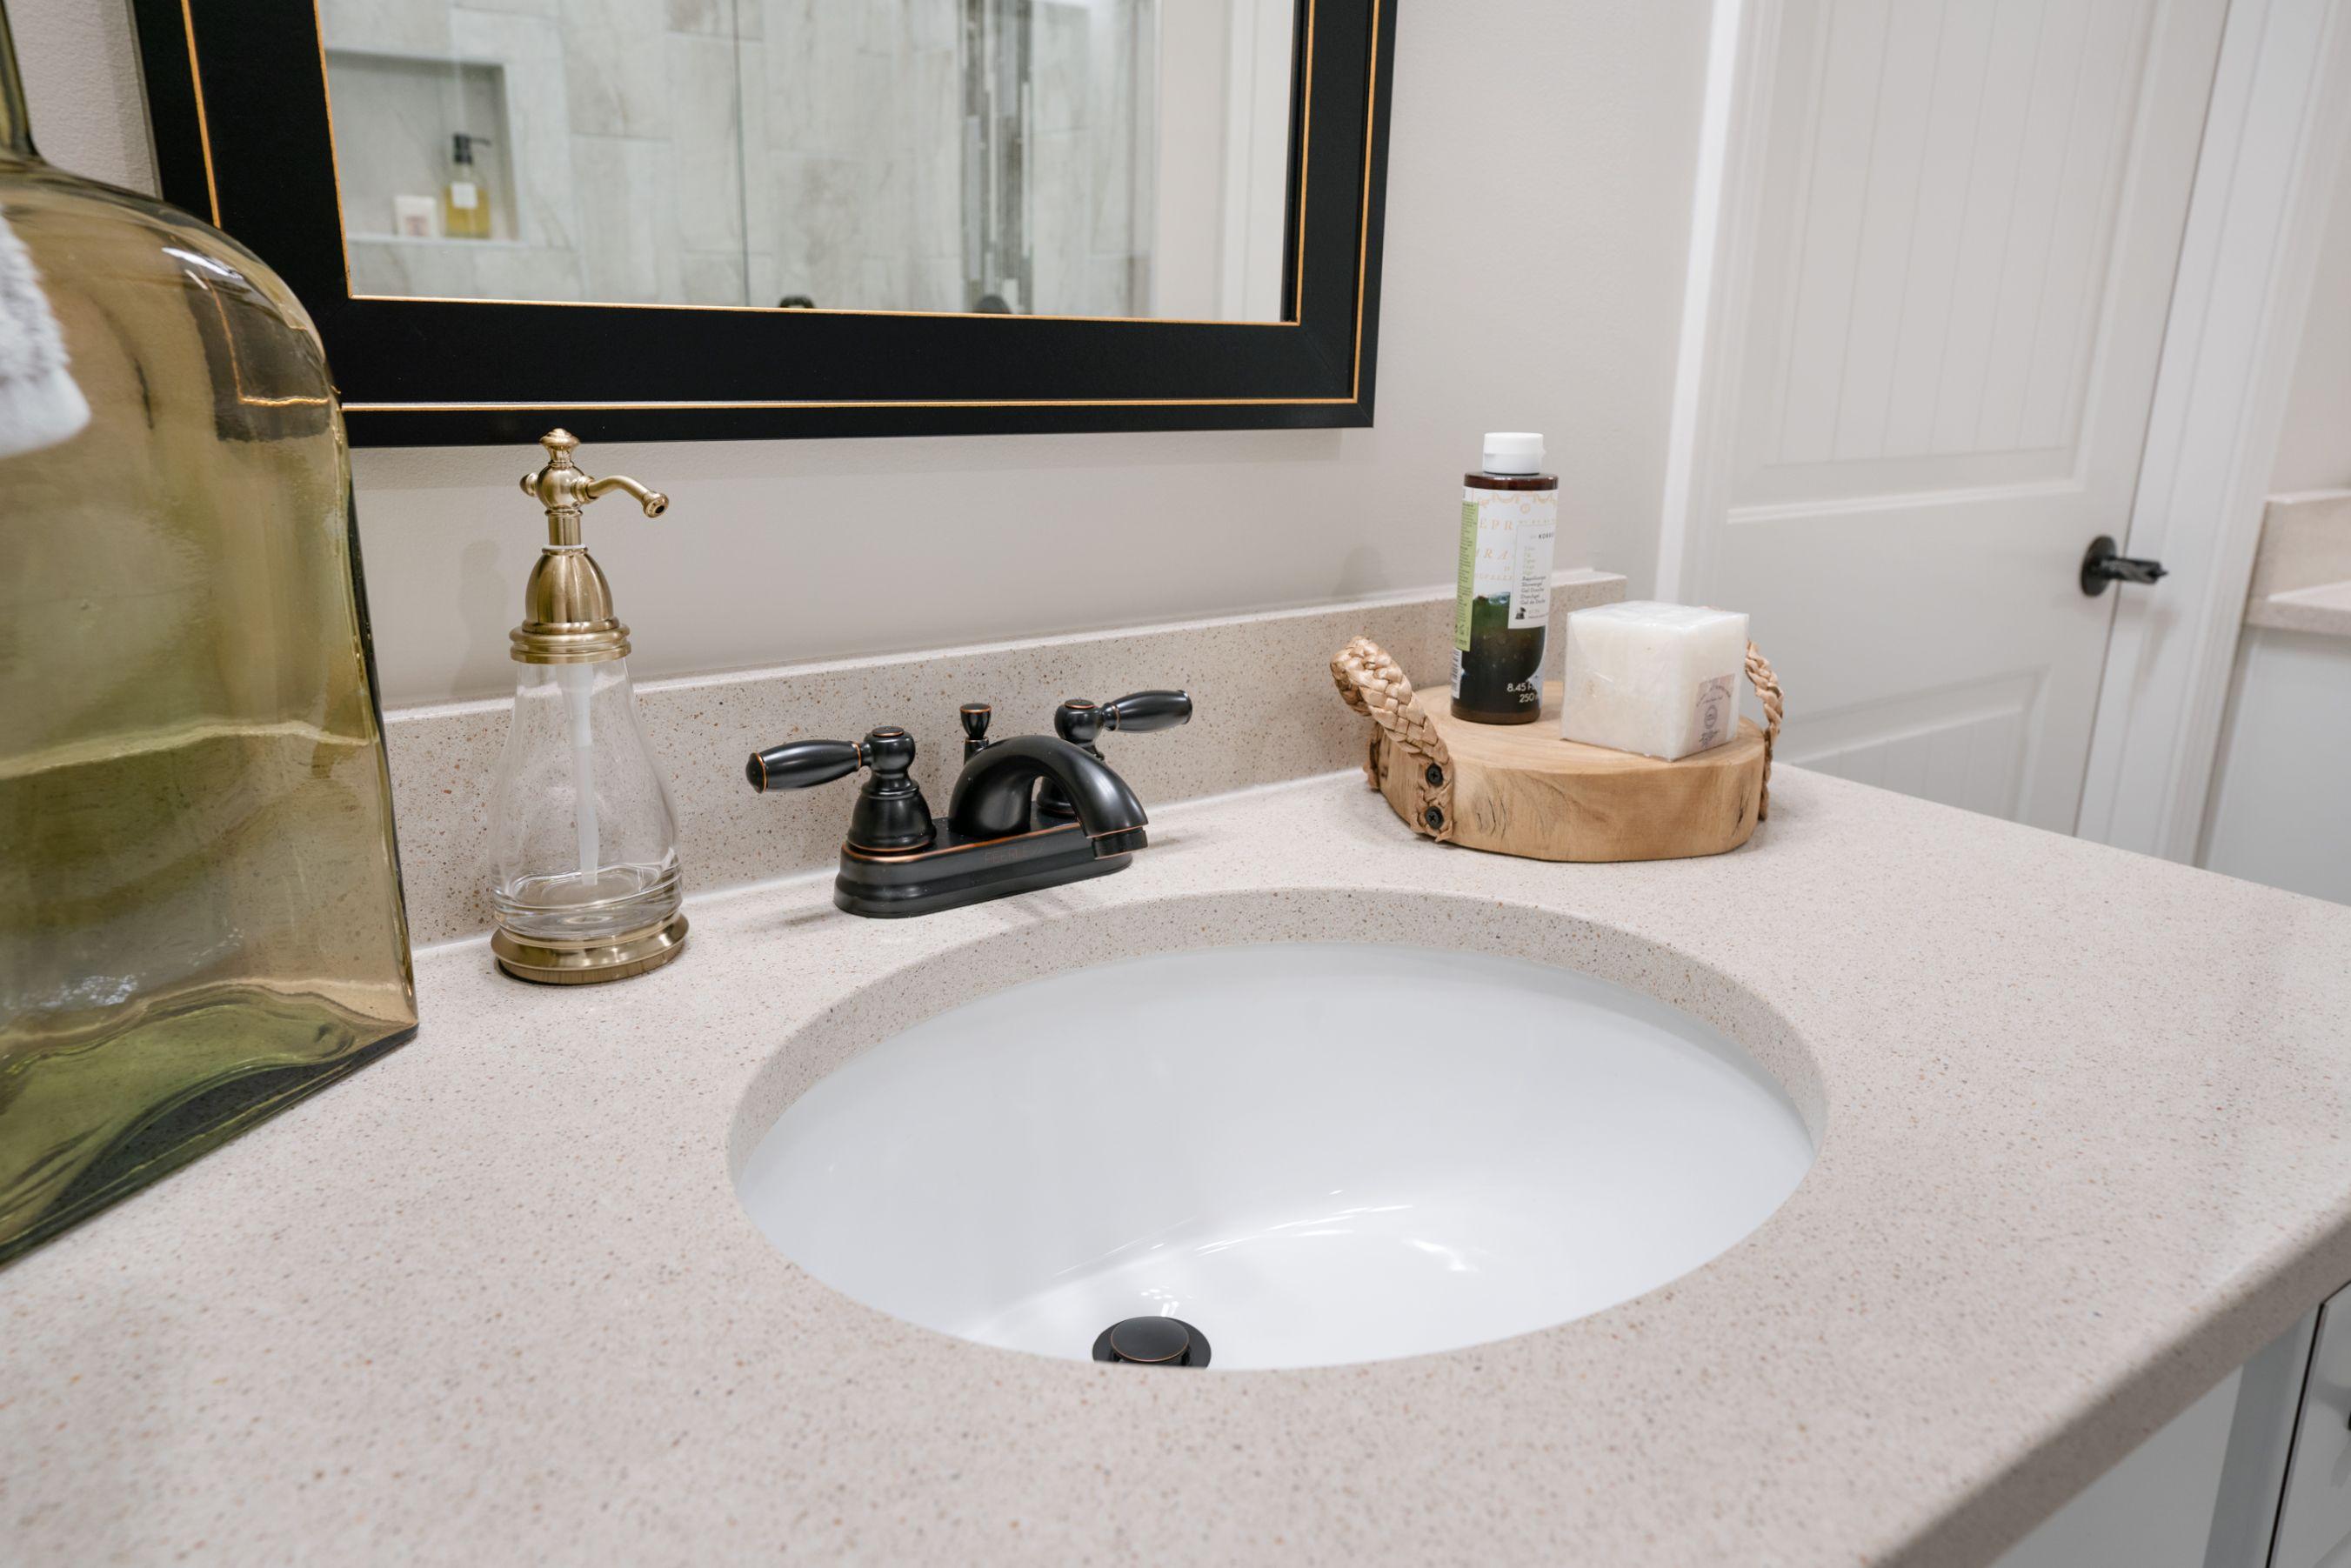 Bathroom featured in the Rabun (Active Adult) By Artisan Built Communities in Atlanta, GA